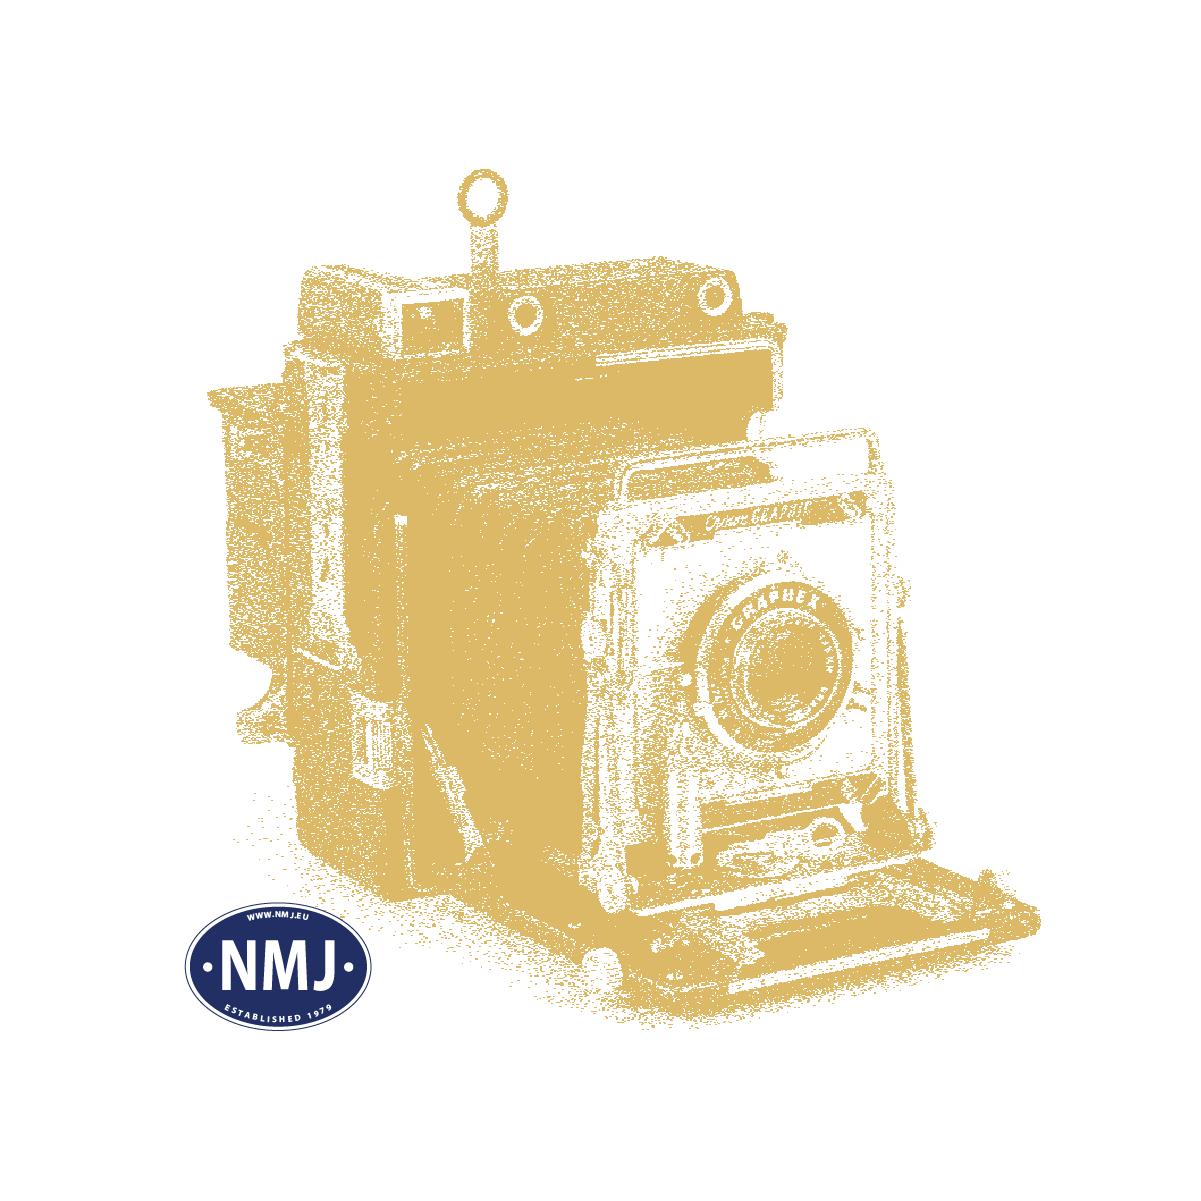 "NMJT605.305 - NMJ Topline SJ Ibblps-t 820 0 291-6 ""Nyckelkund"" refrigerator car"